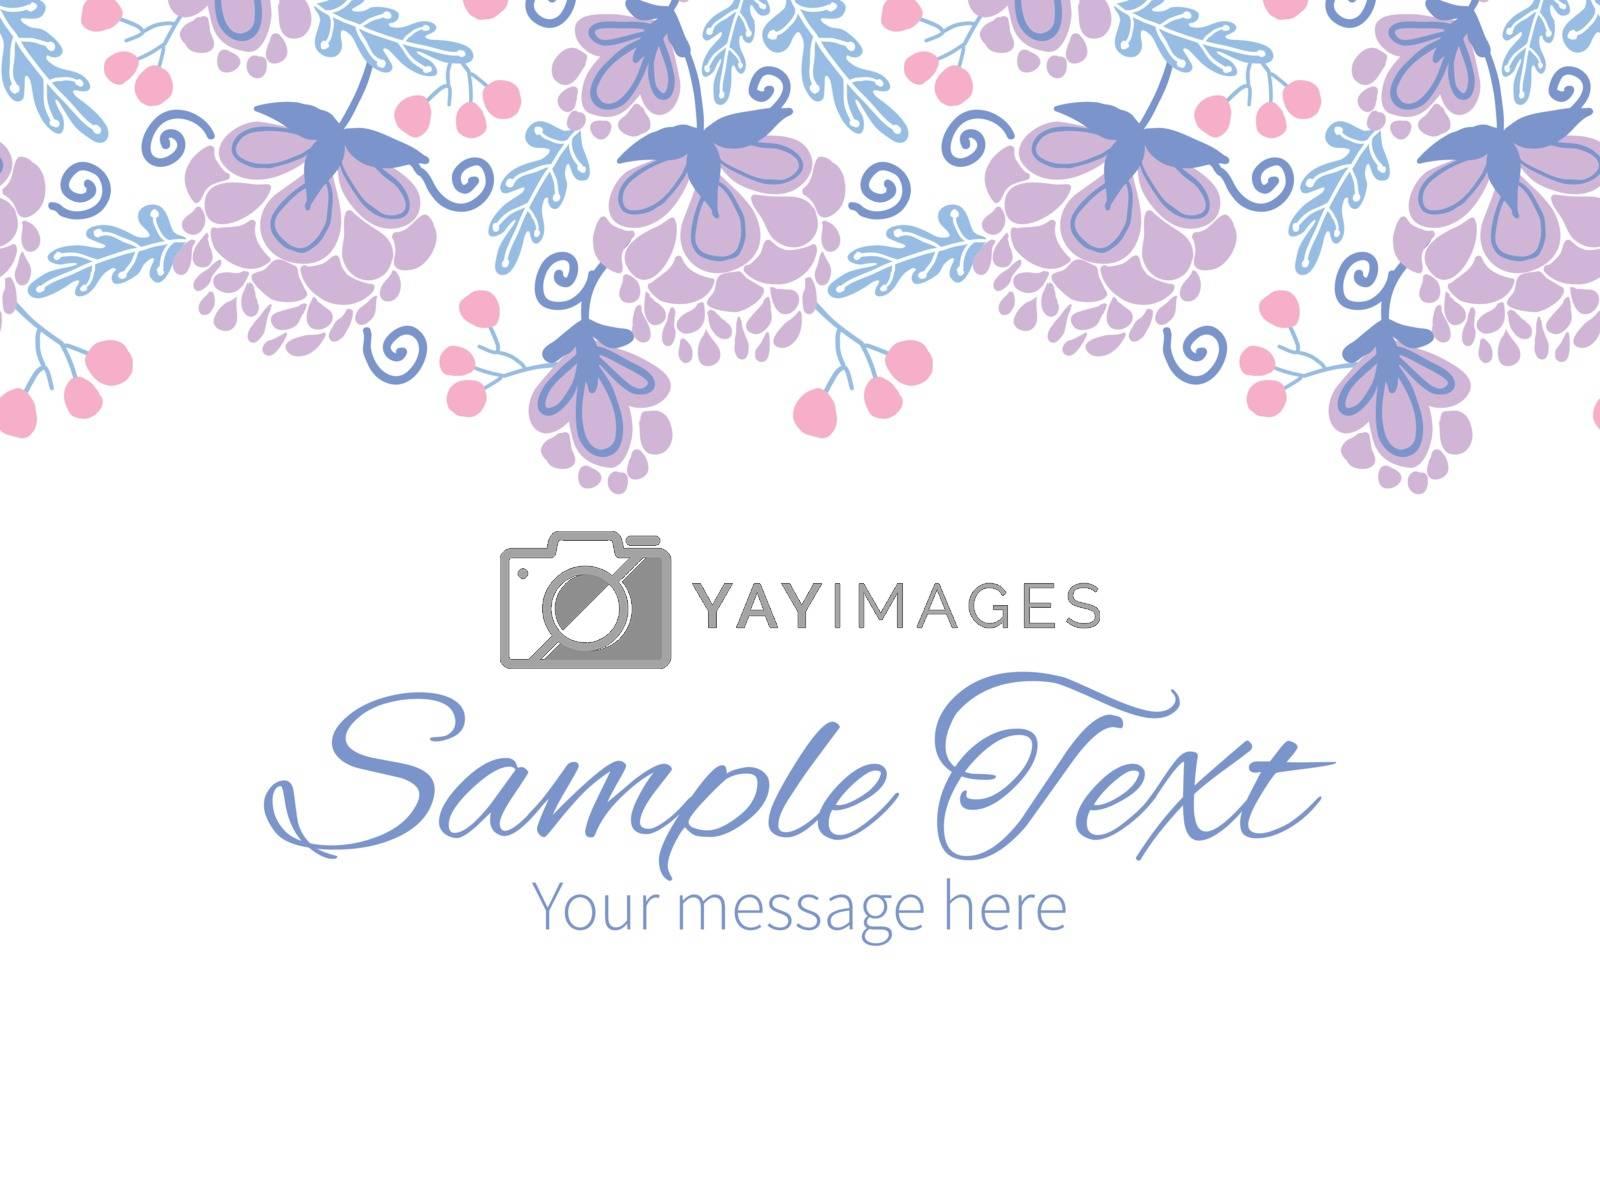 Vector soft purple flowers horizontal border greeting card invitation template graphic design